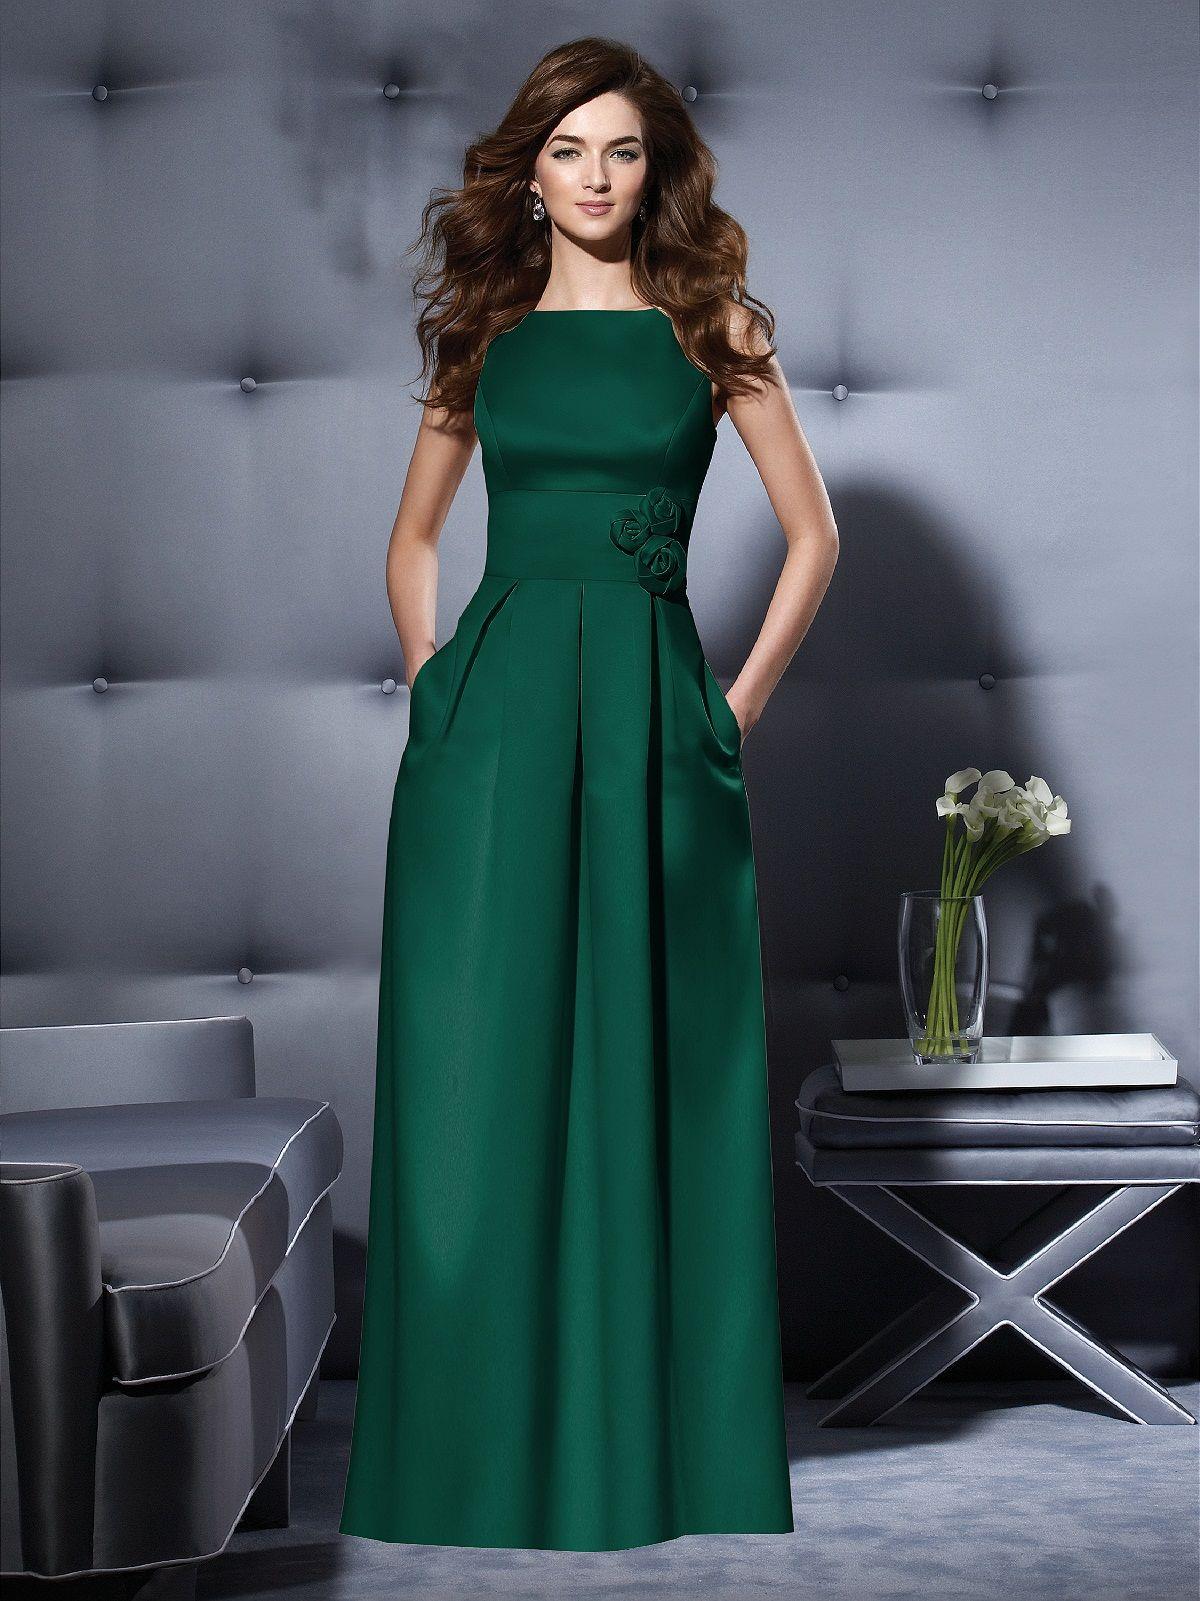 Duchess satin hunter hunter green bridesmaid dress